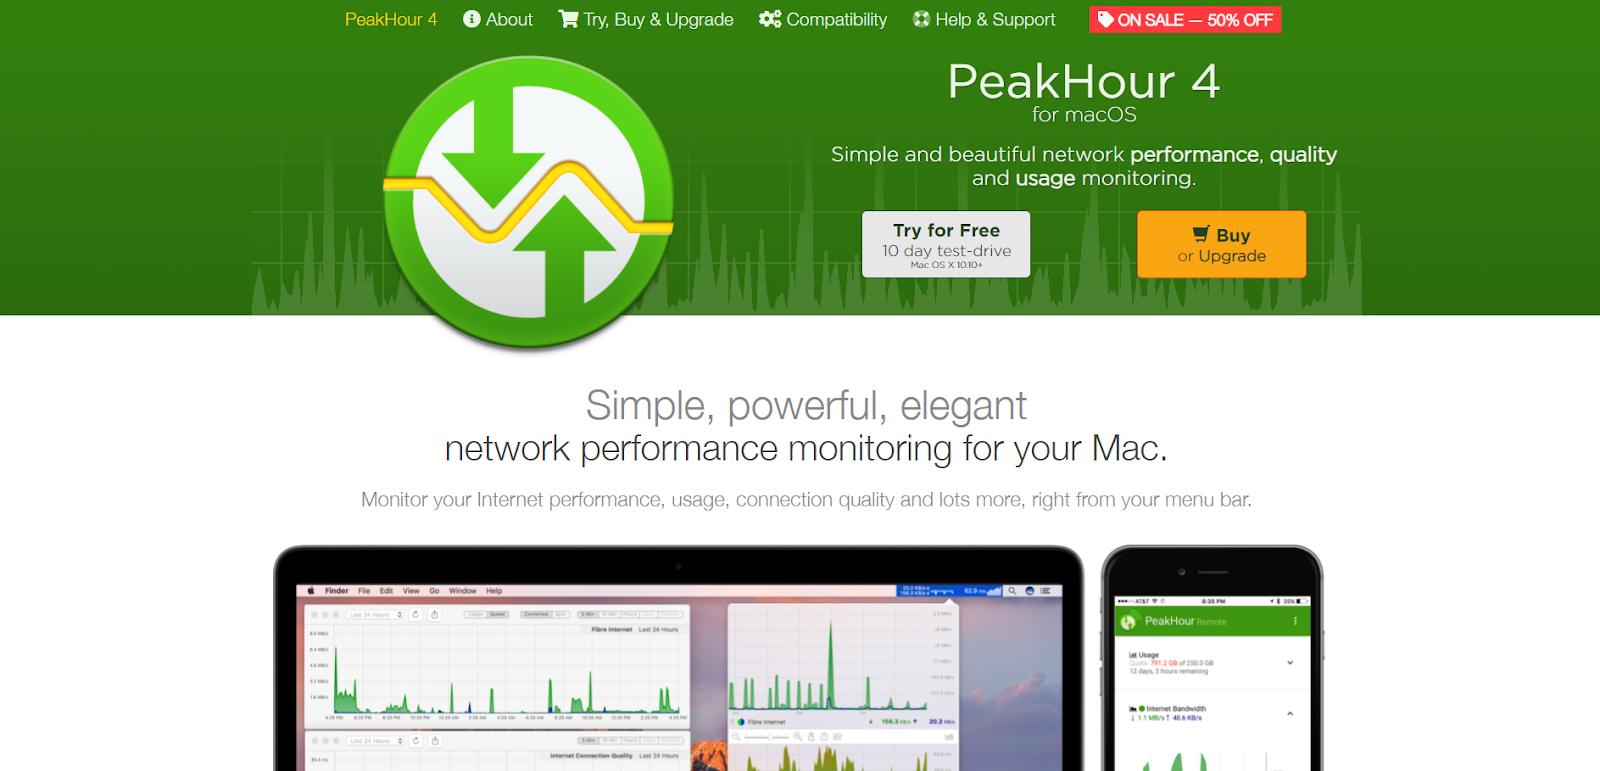 Mac Network Monitoring Software - PeakHour 4